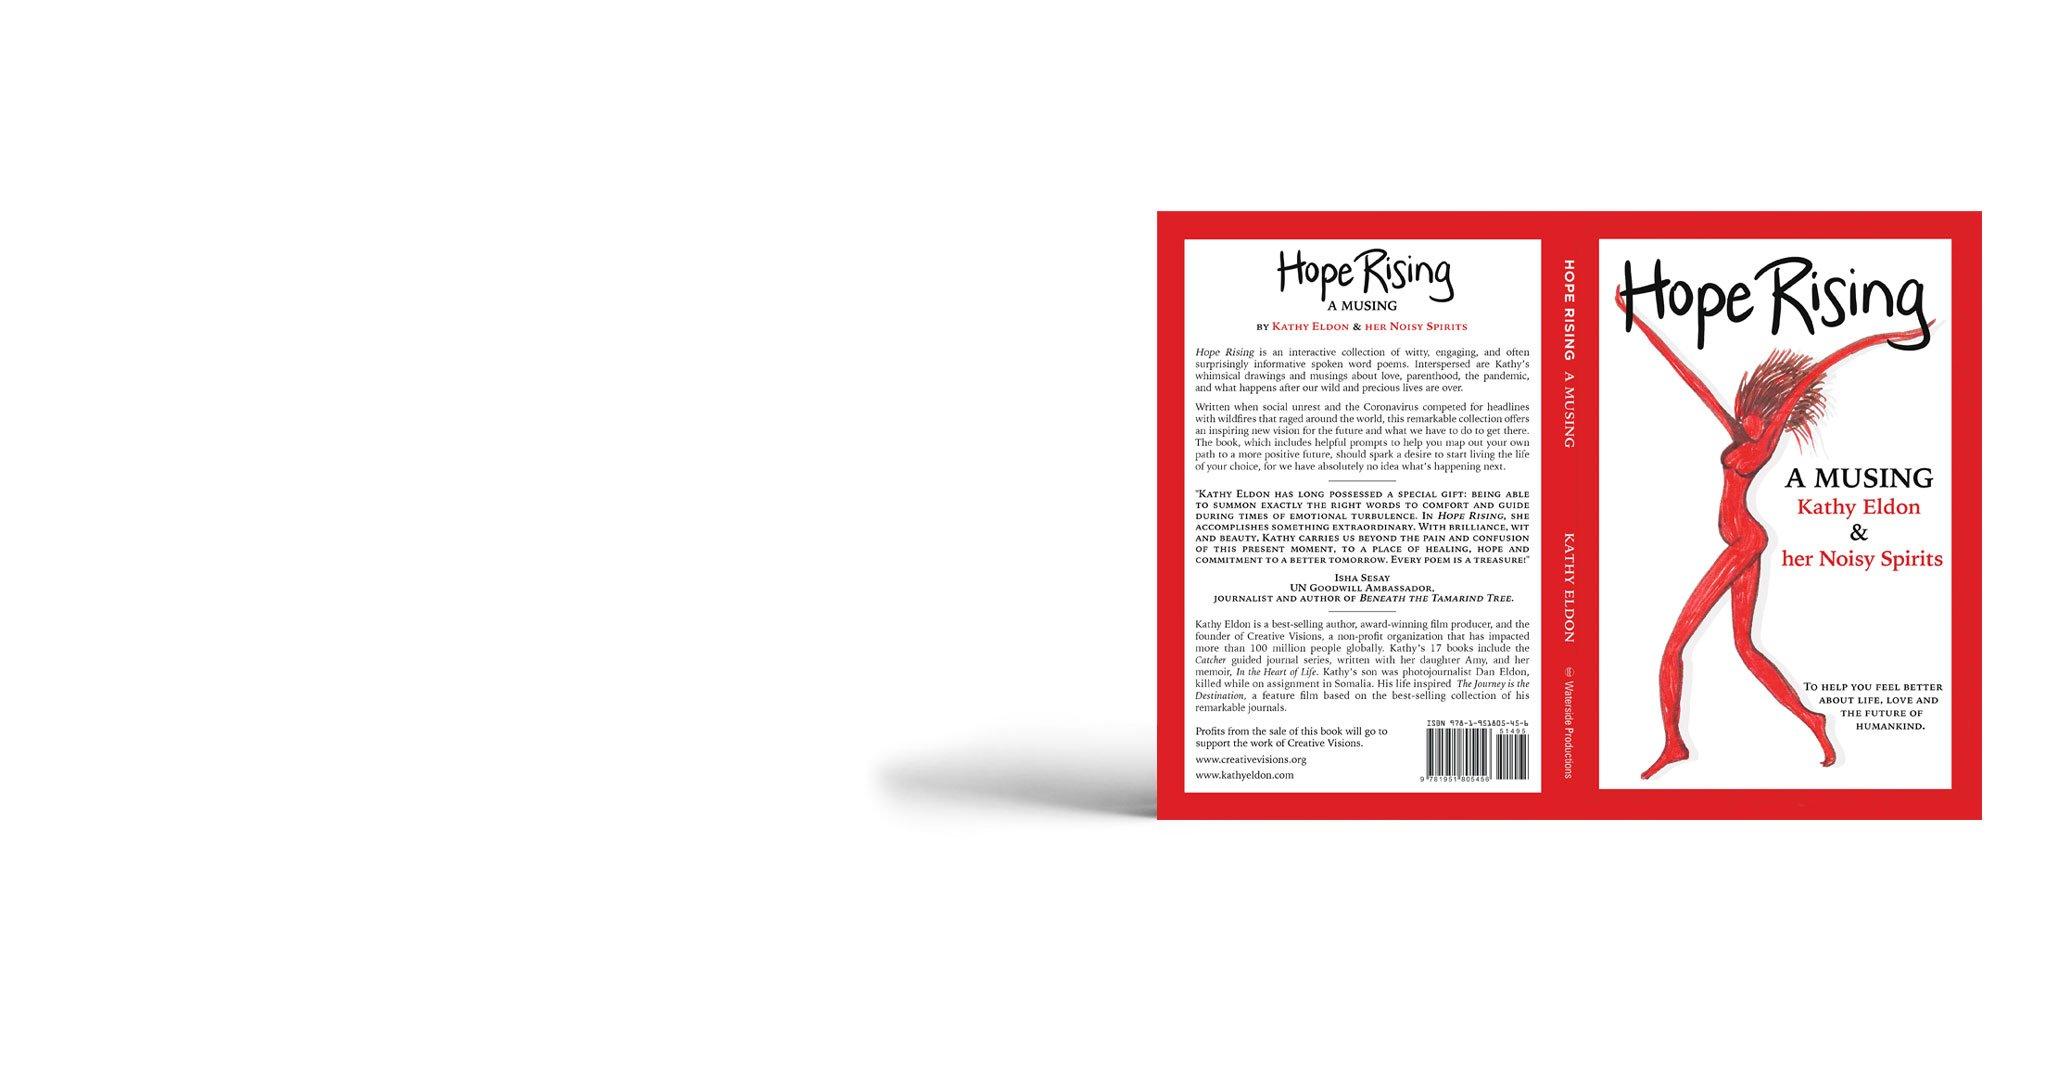 Hope Rising: A Musing